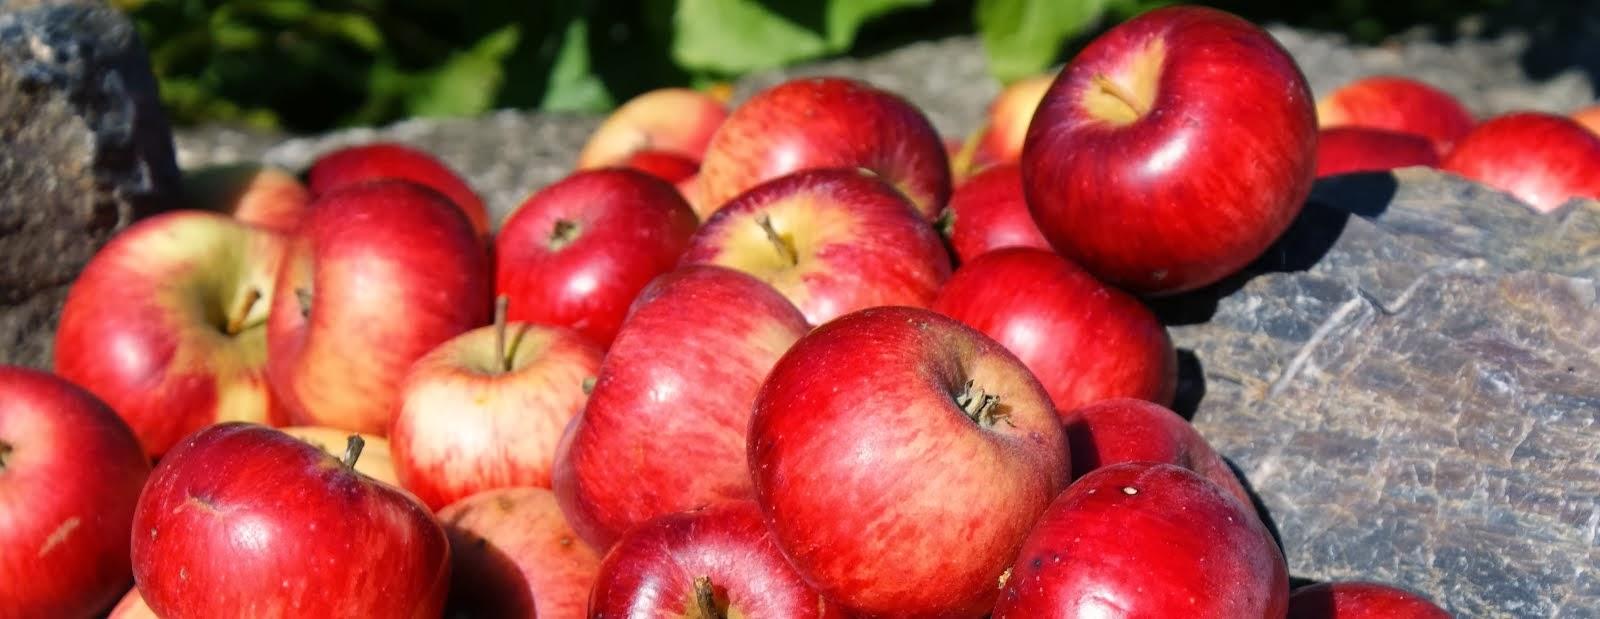 expatova's apples